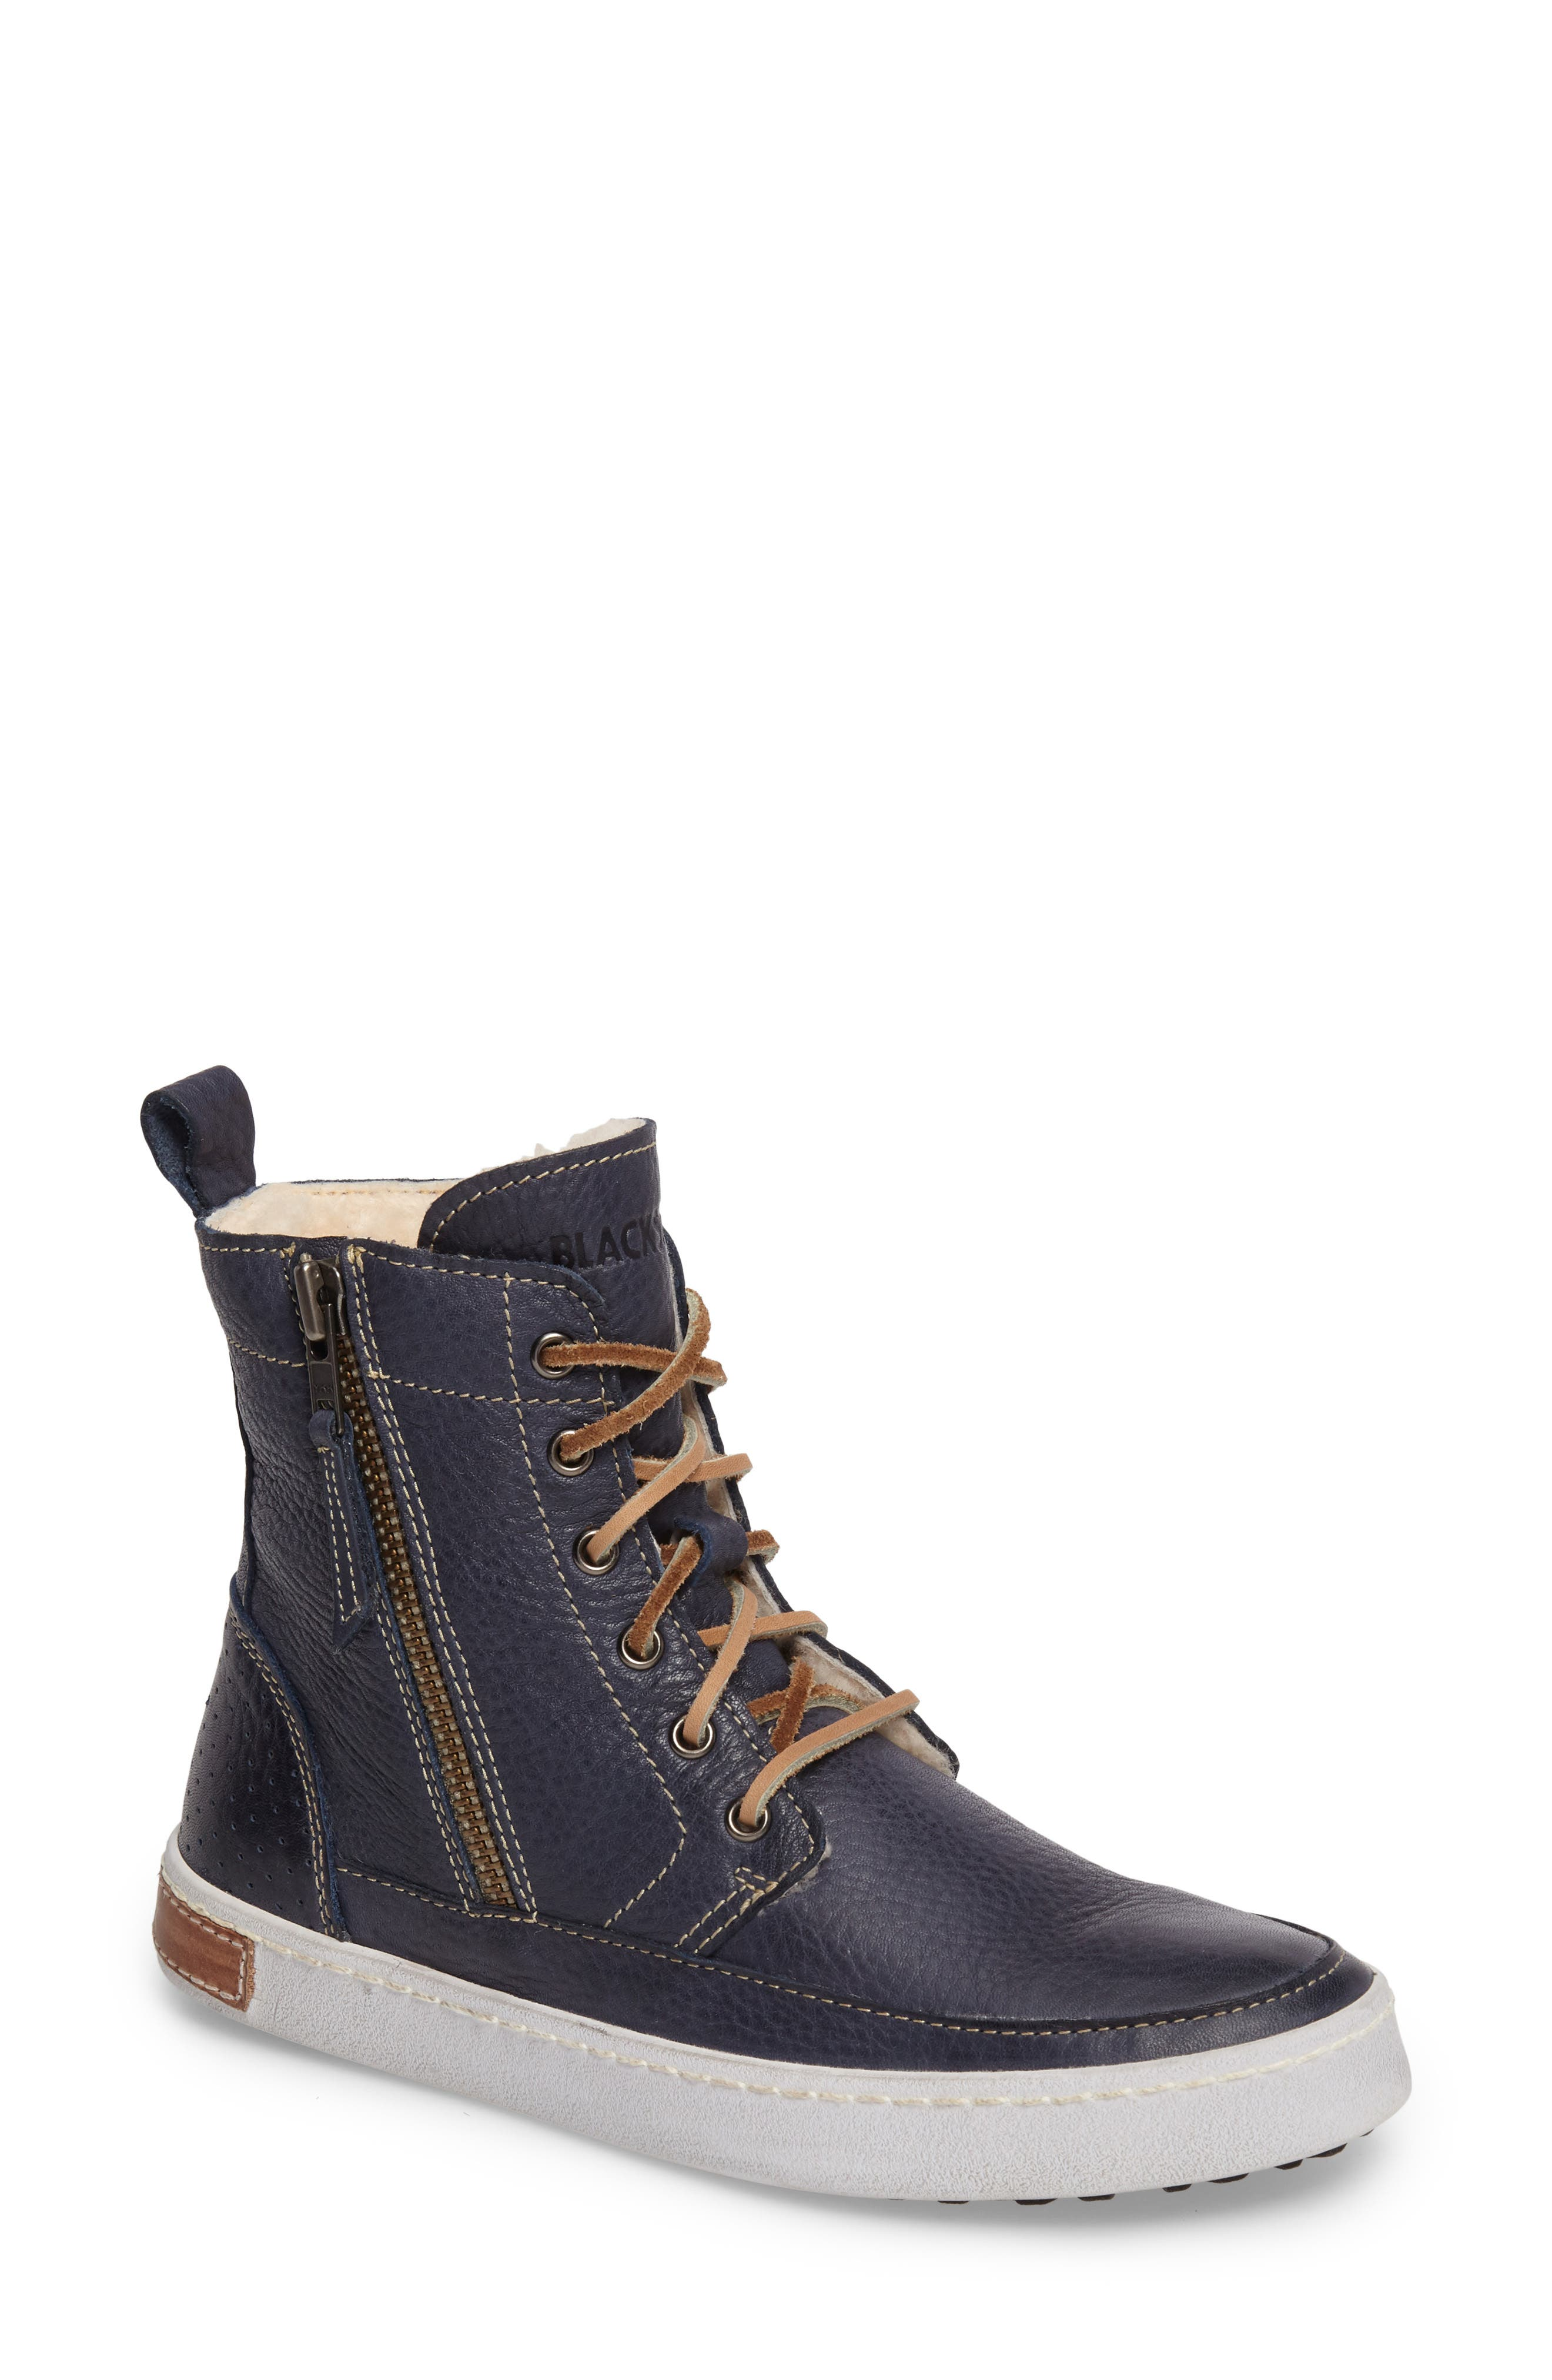 Main Image - Blackstone 'CW96' Genuine Shearling Lined Sneaker Boot (Women)